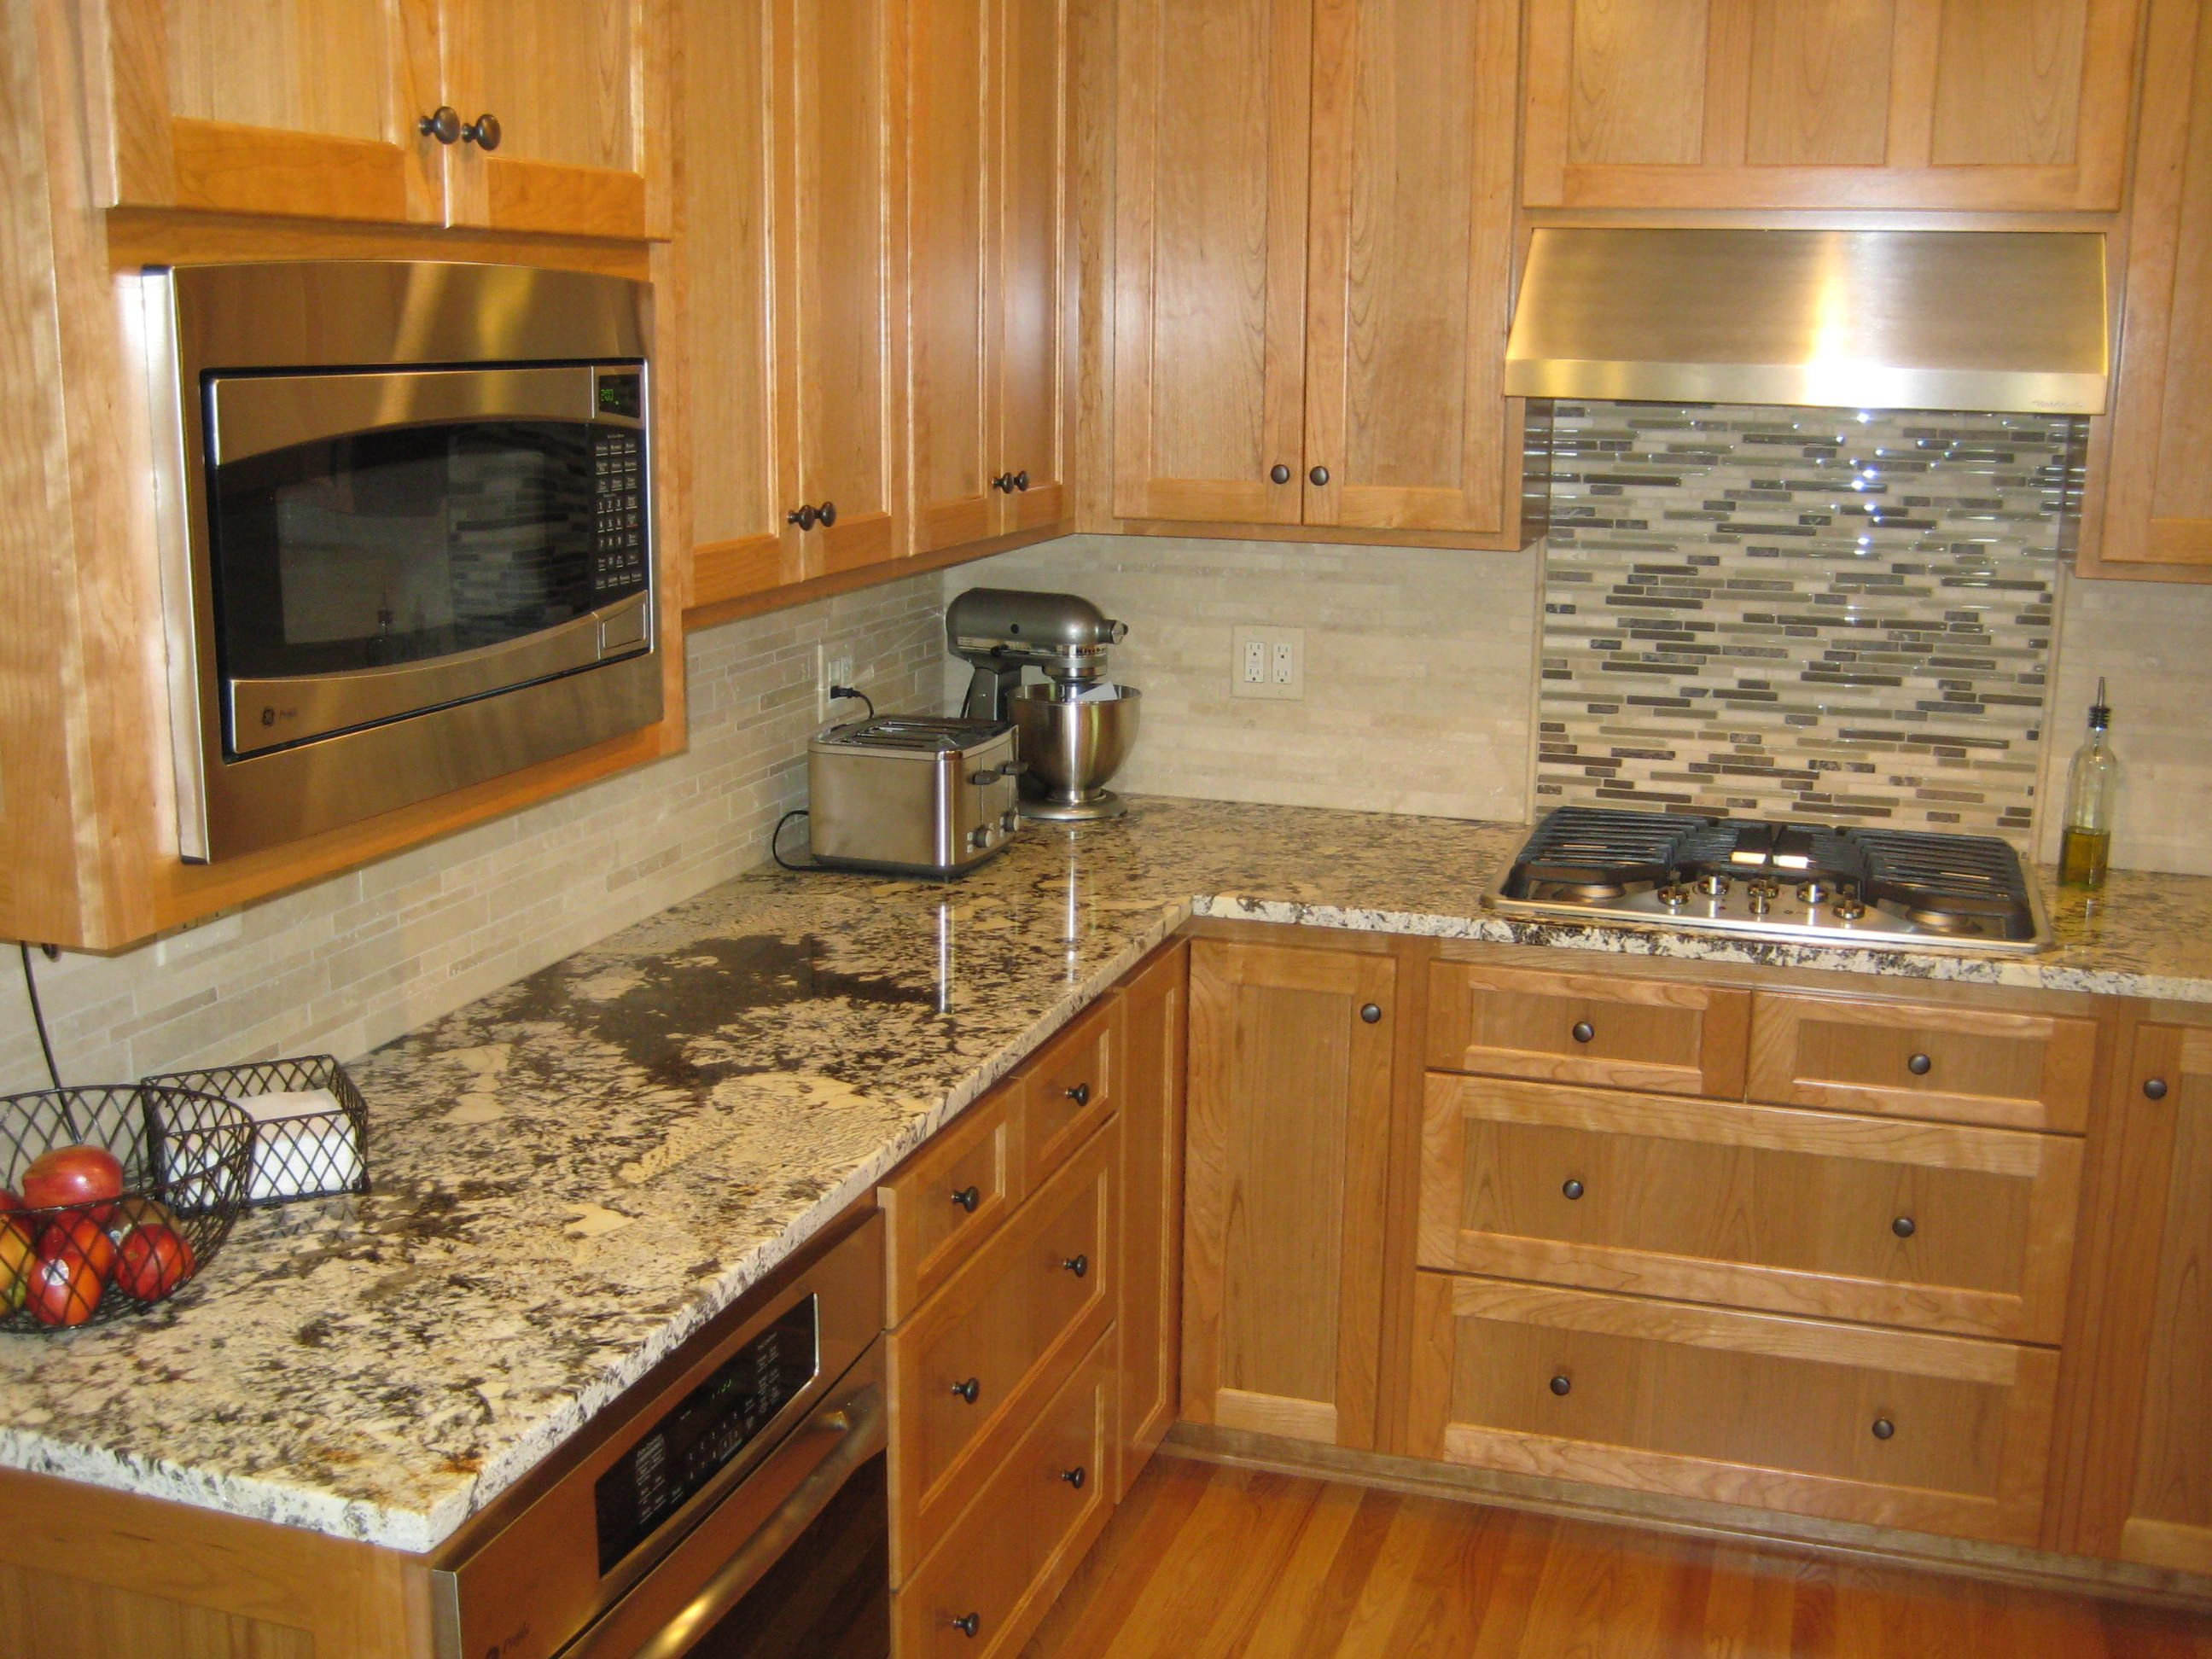 Bianco Antico granite like backsplash but not stove